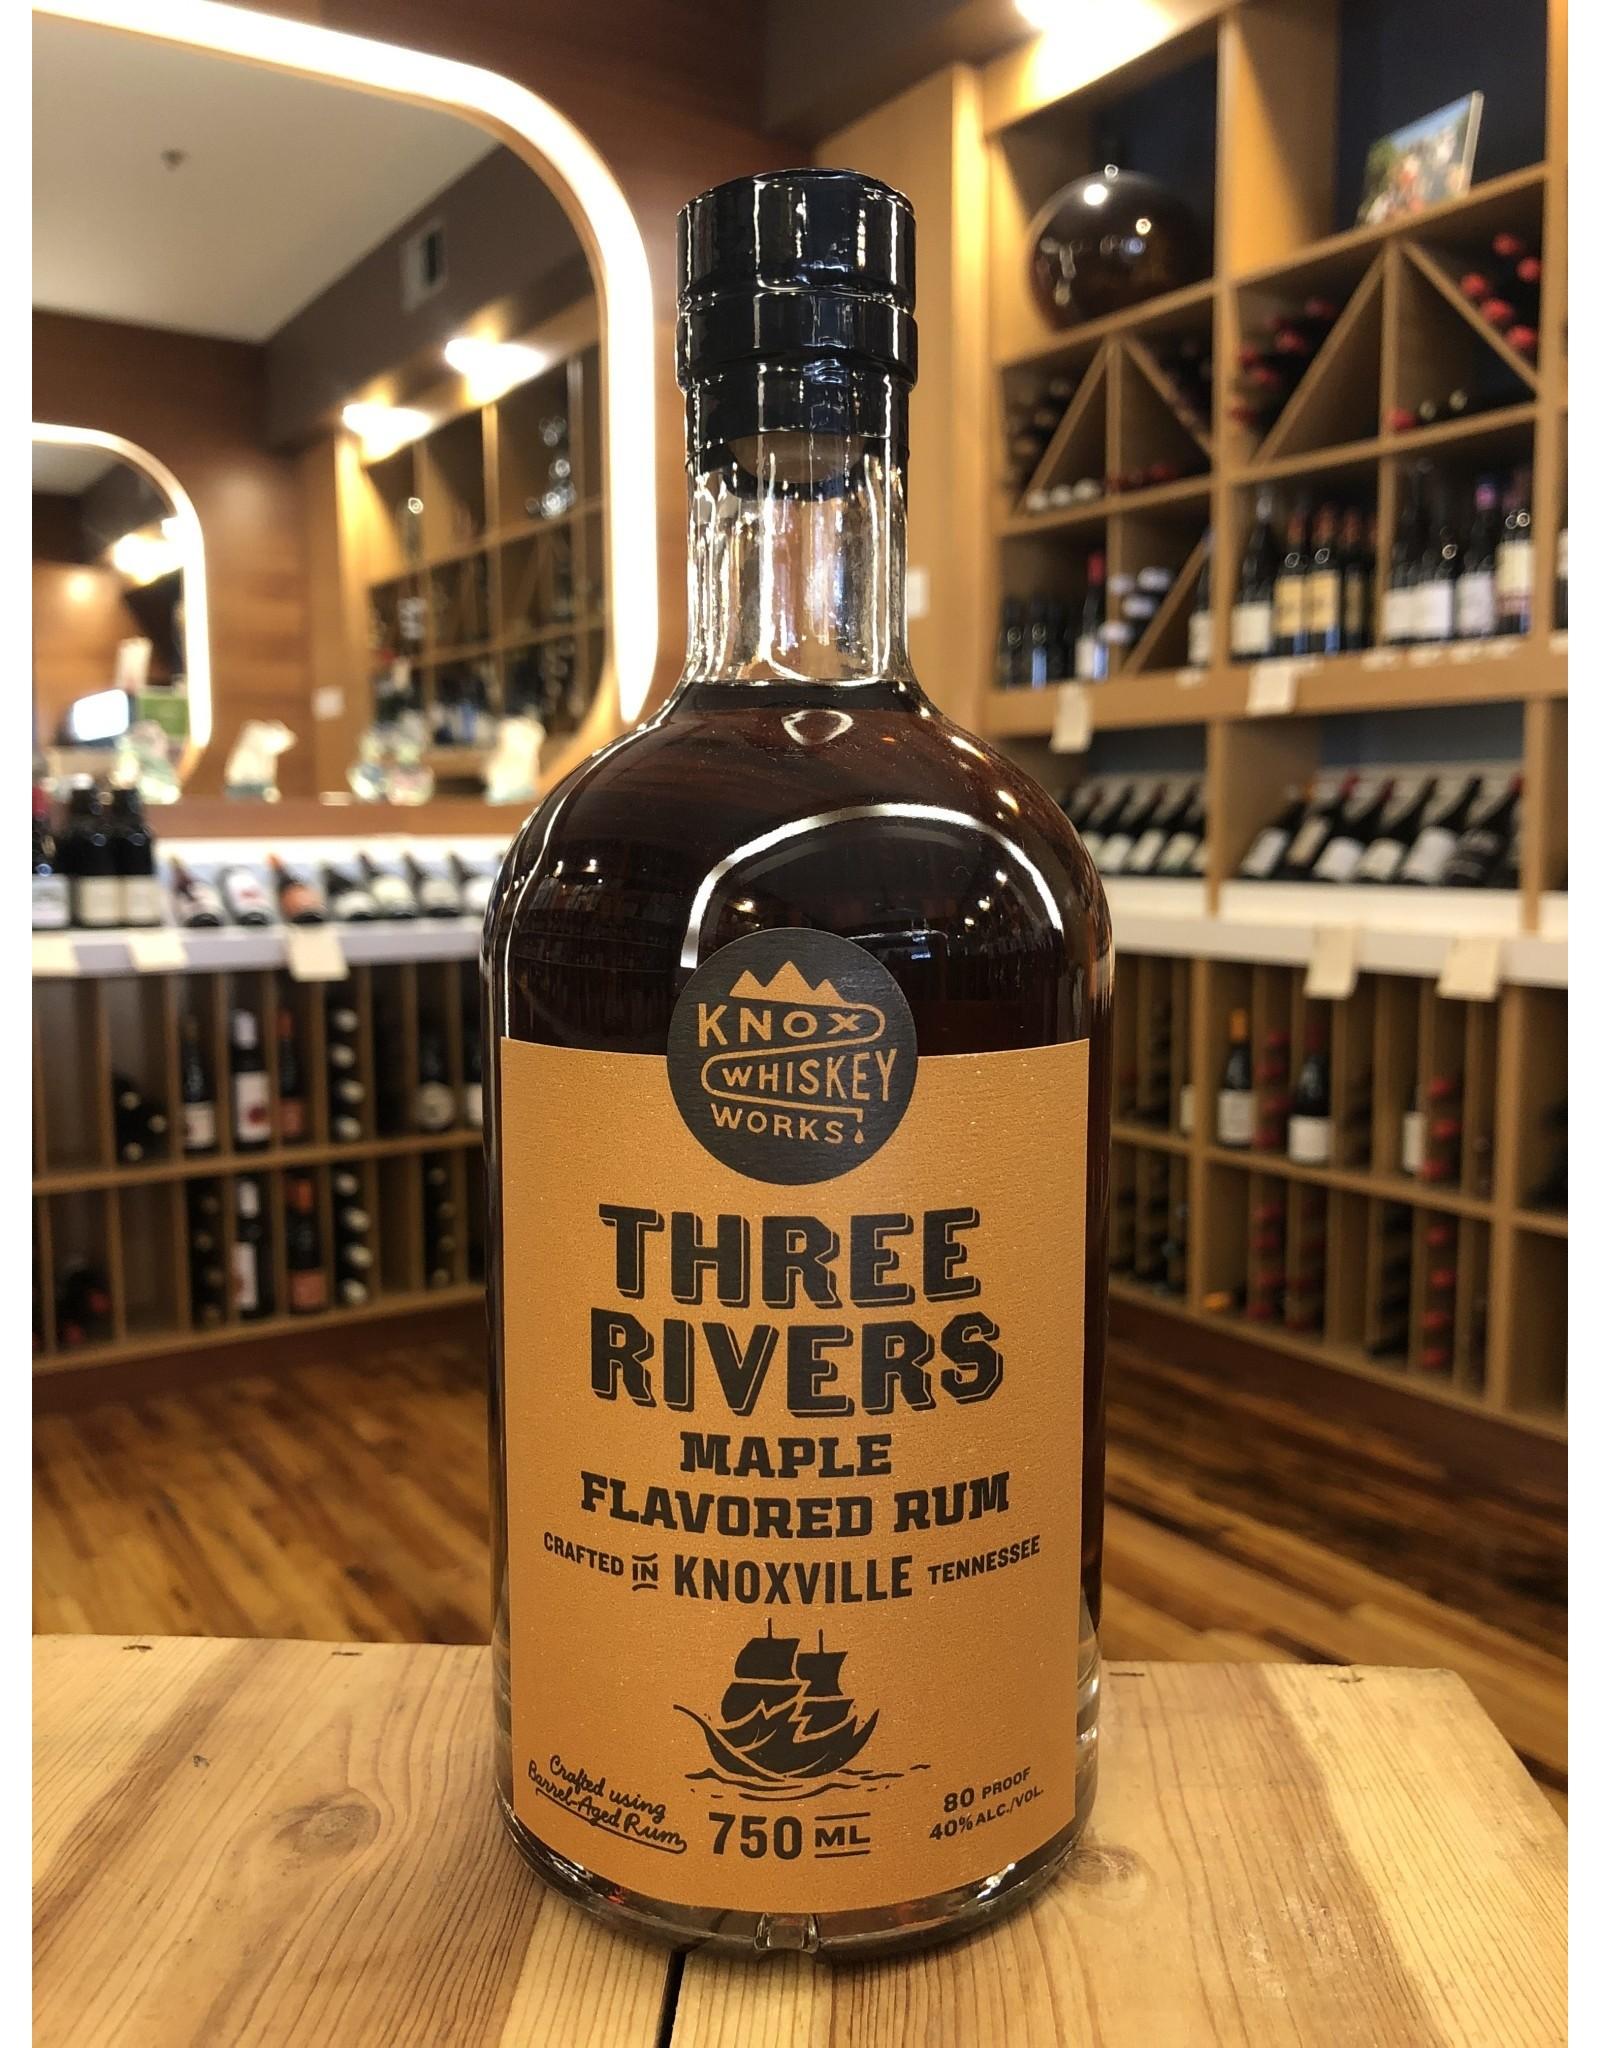 Knox Whiskey Works Three Rivers Maple Rum - 750 ML